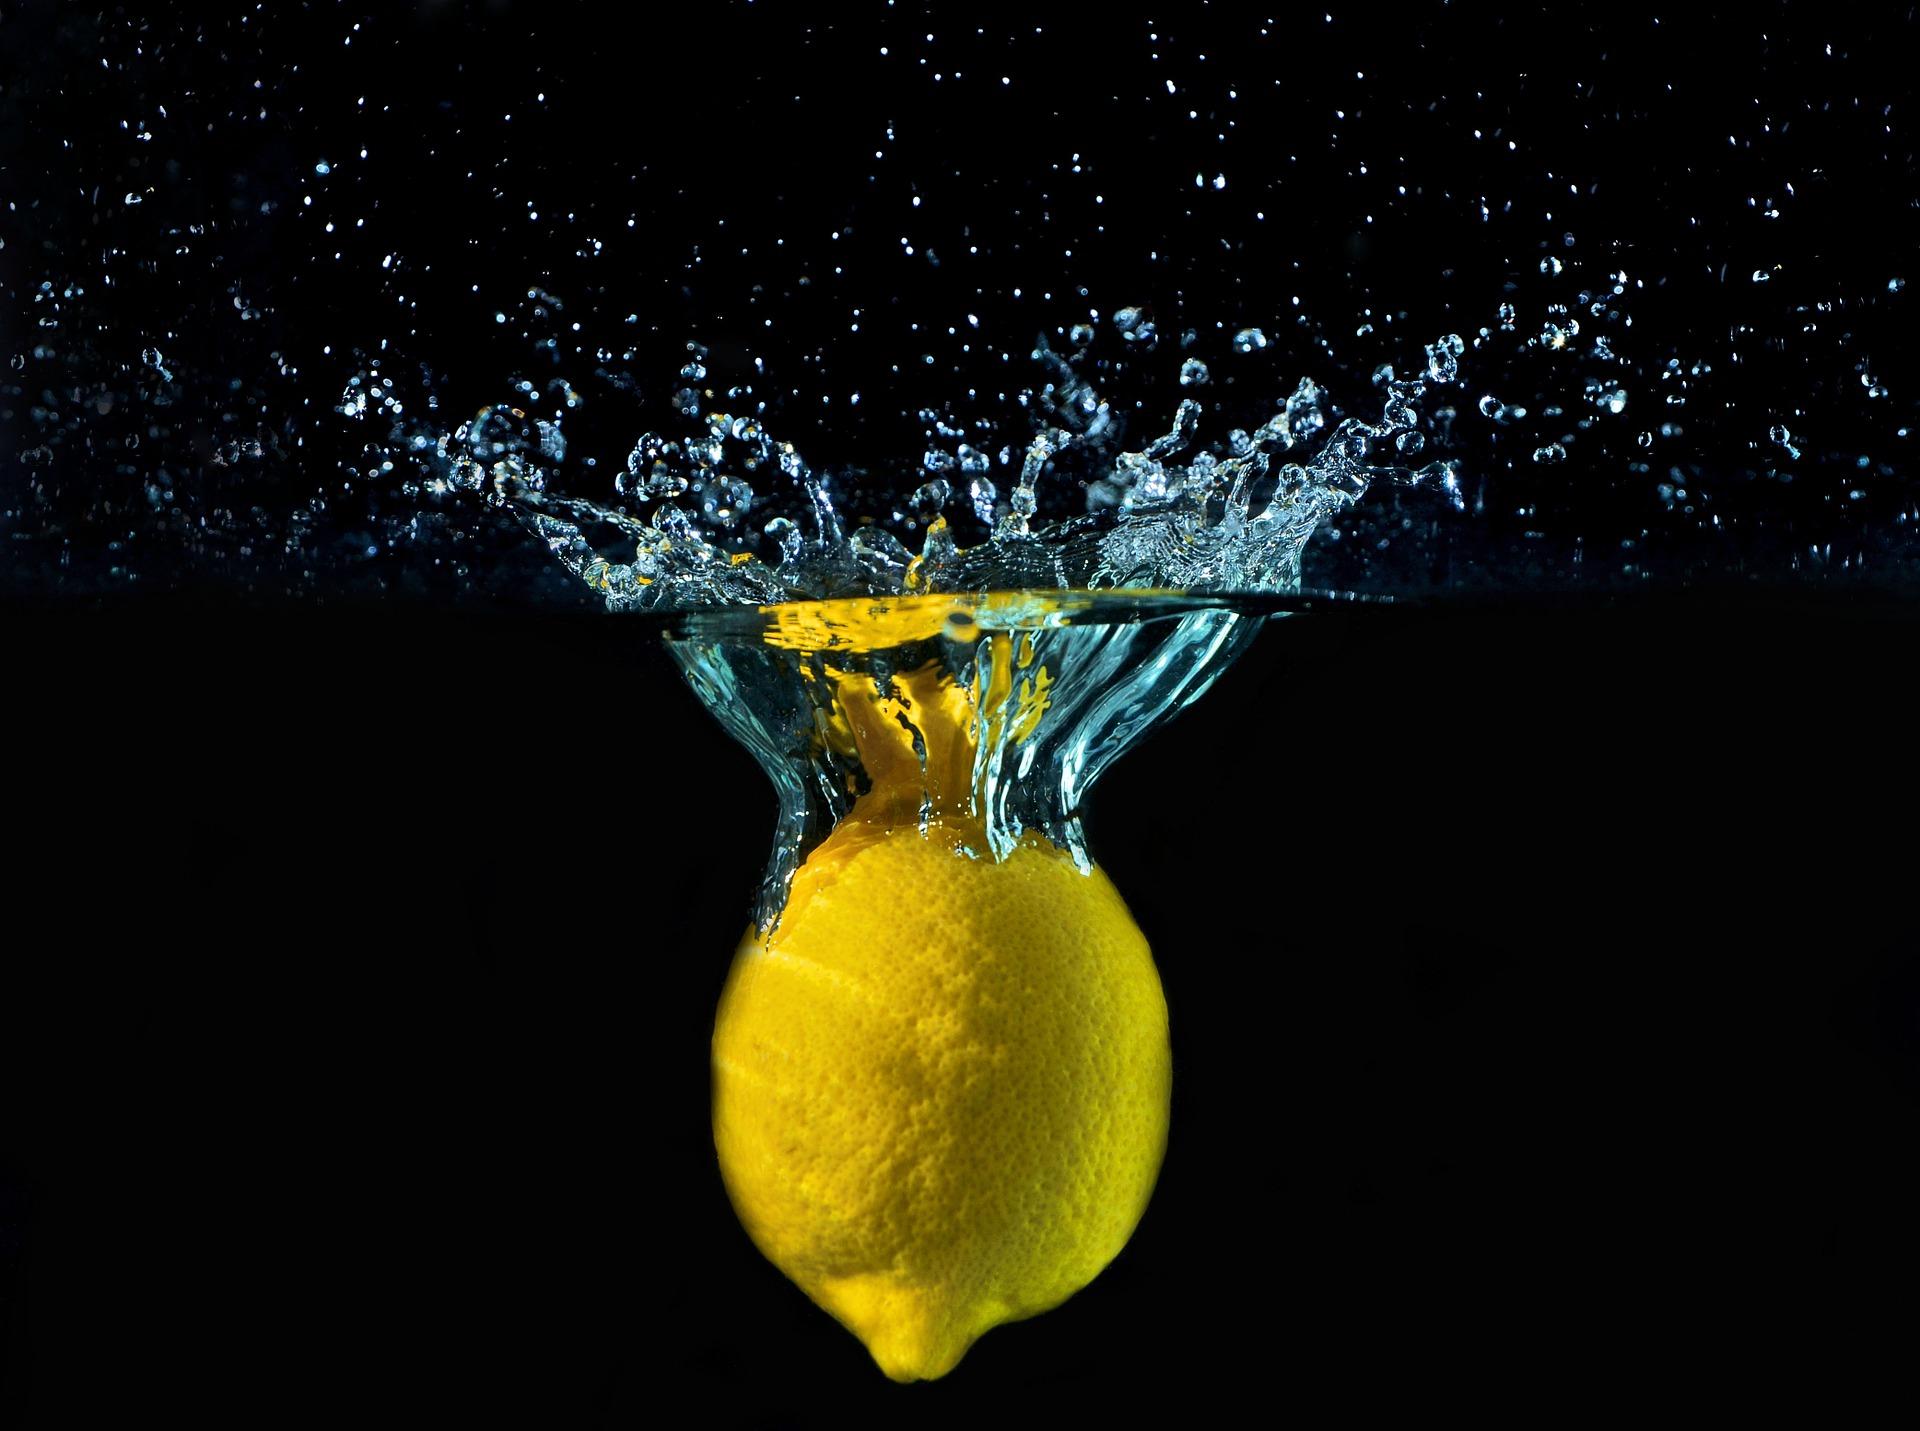 fresh produce: lemon in water